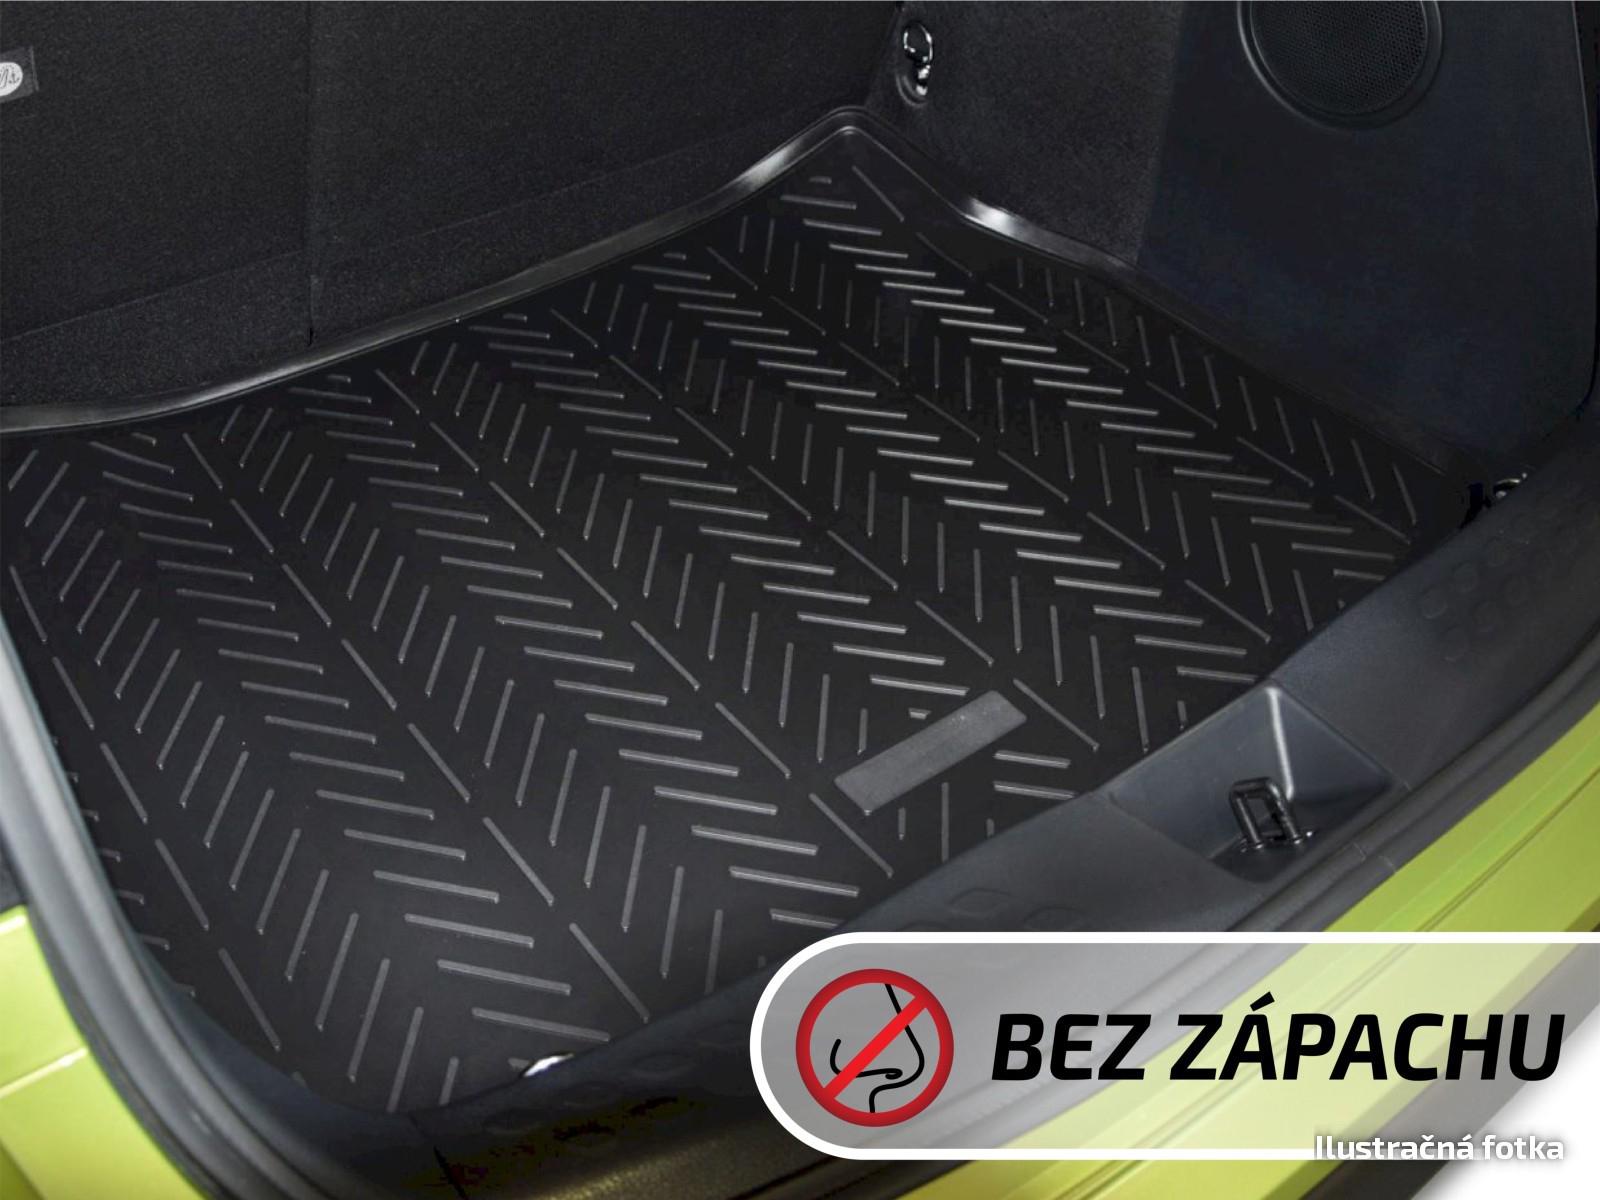 Poza cu Tavita de portbagaj Premium, Volkswagen Jetta, 2010-2018